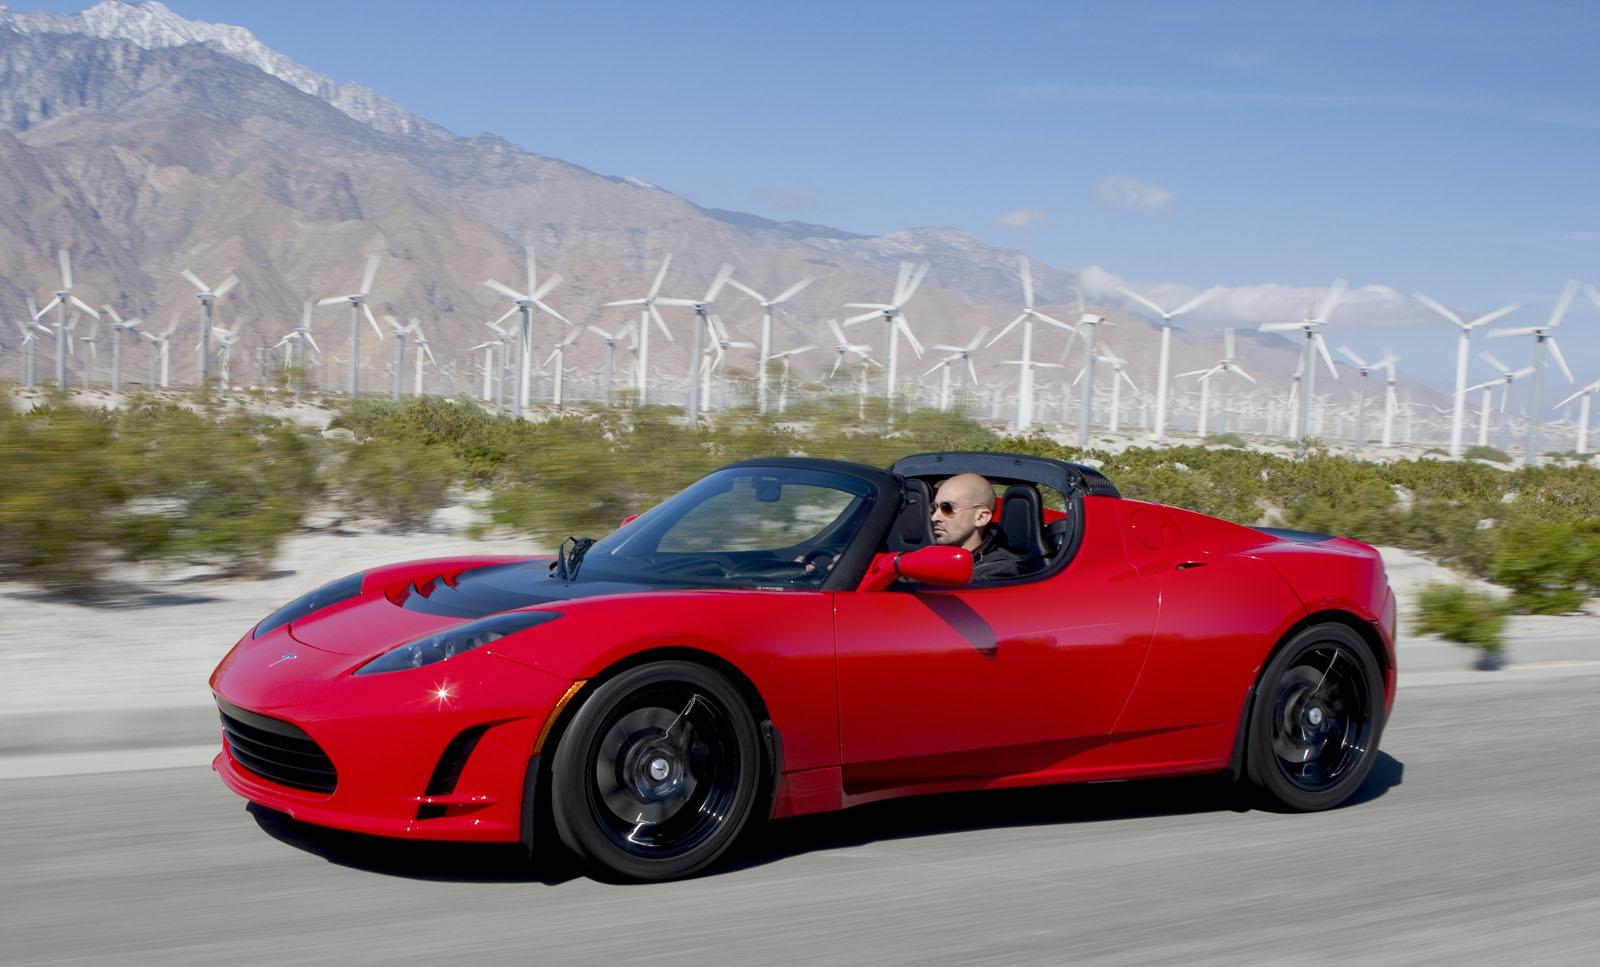 Tesla Roadster July 19, 2006